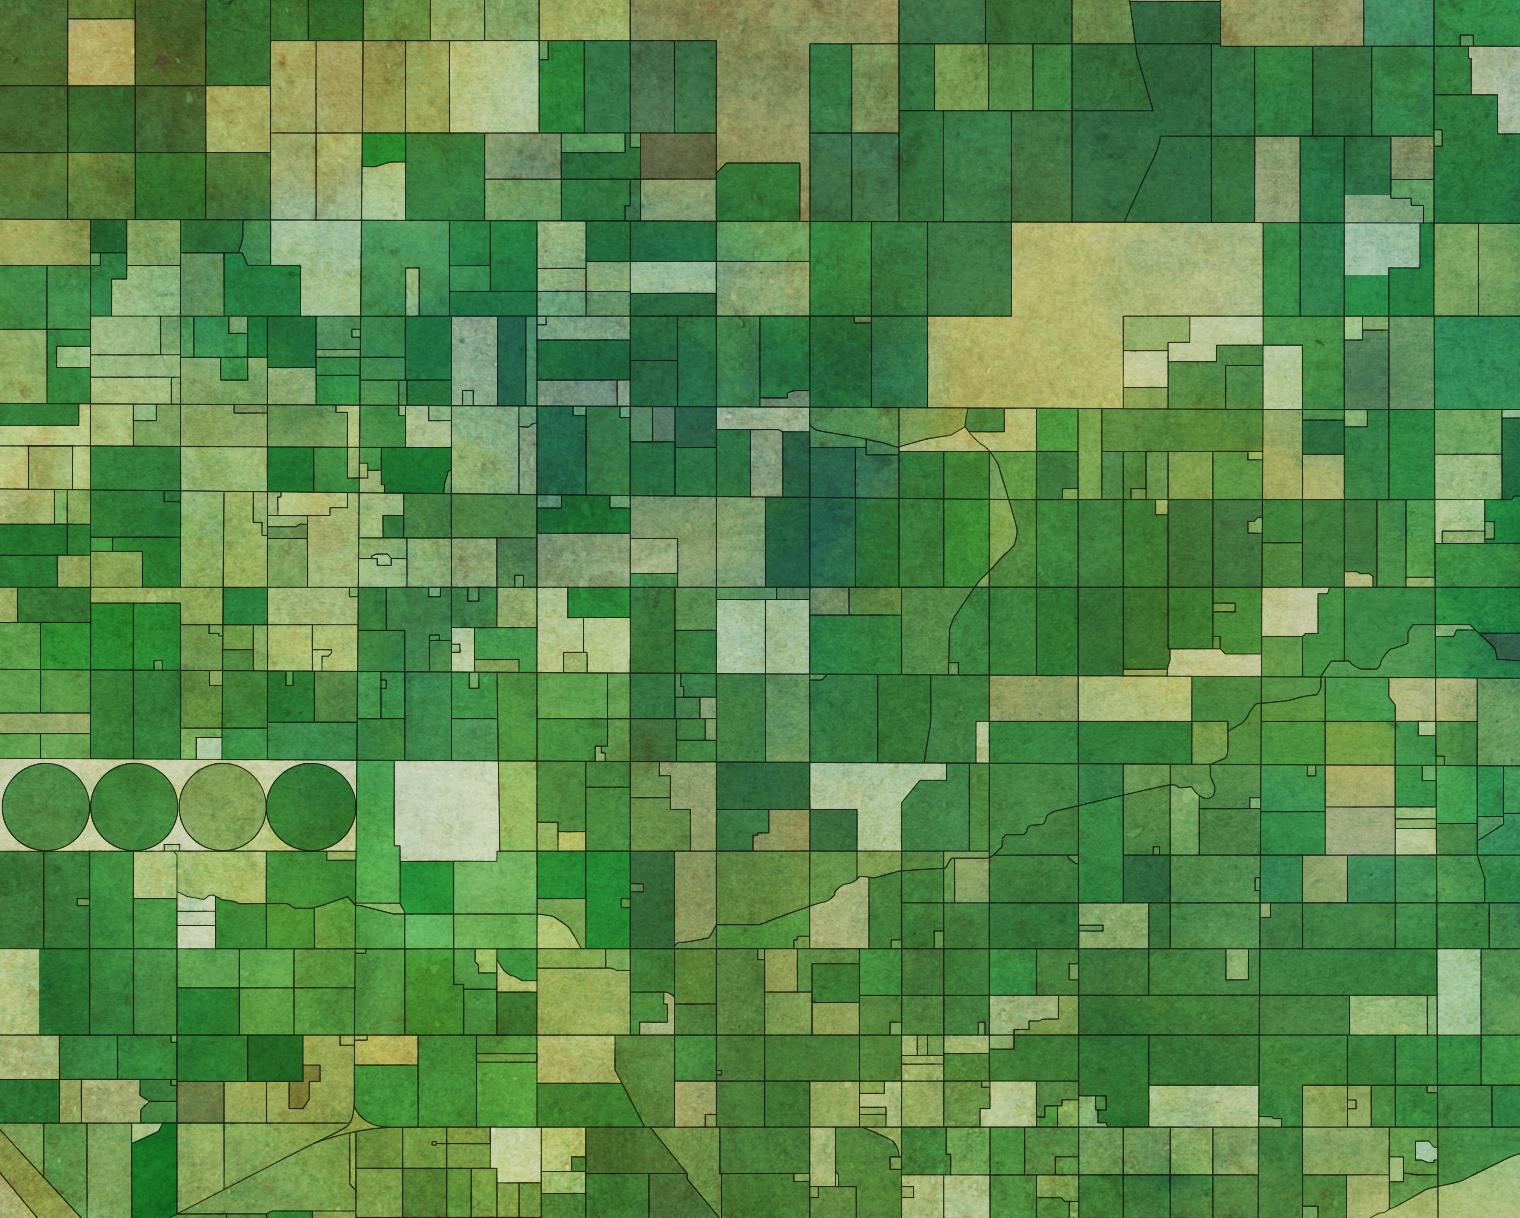 47 - crop-aerials 3.png